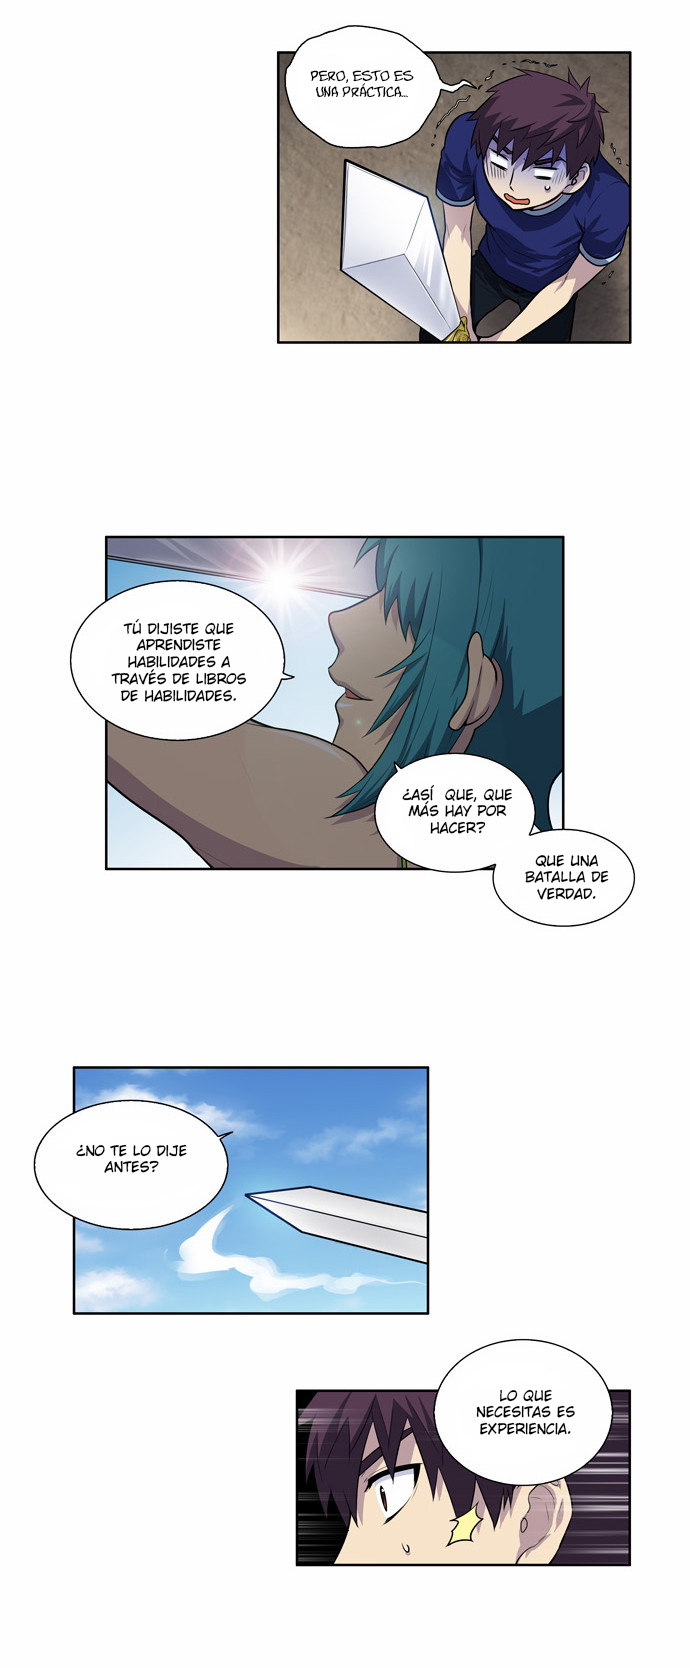 https://c5.ninemanga.com/es_manga/61/1725/449845/53f13d594327d166a891ccad57c42d2d.jpg Page 8